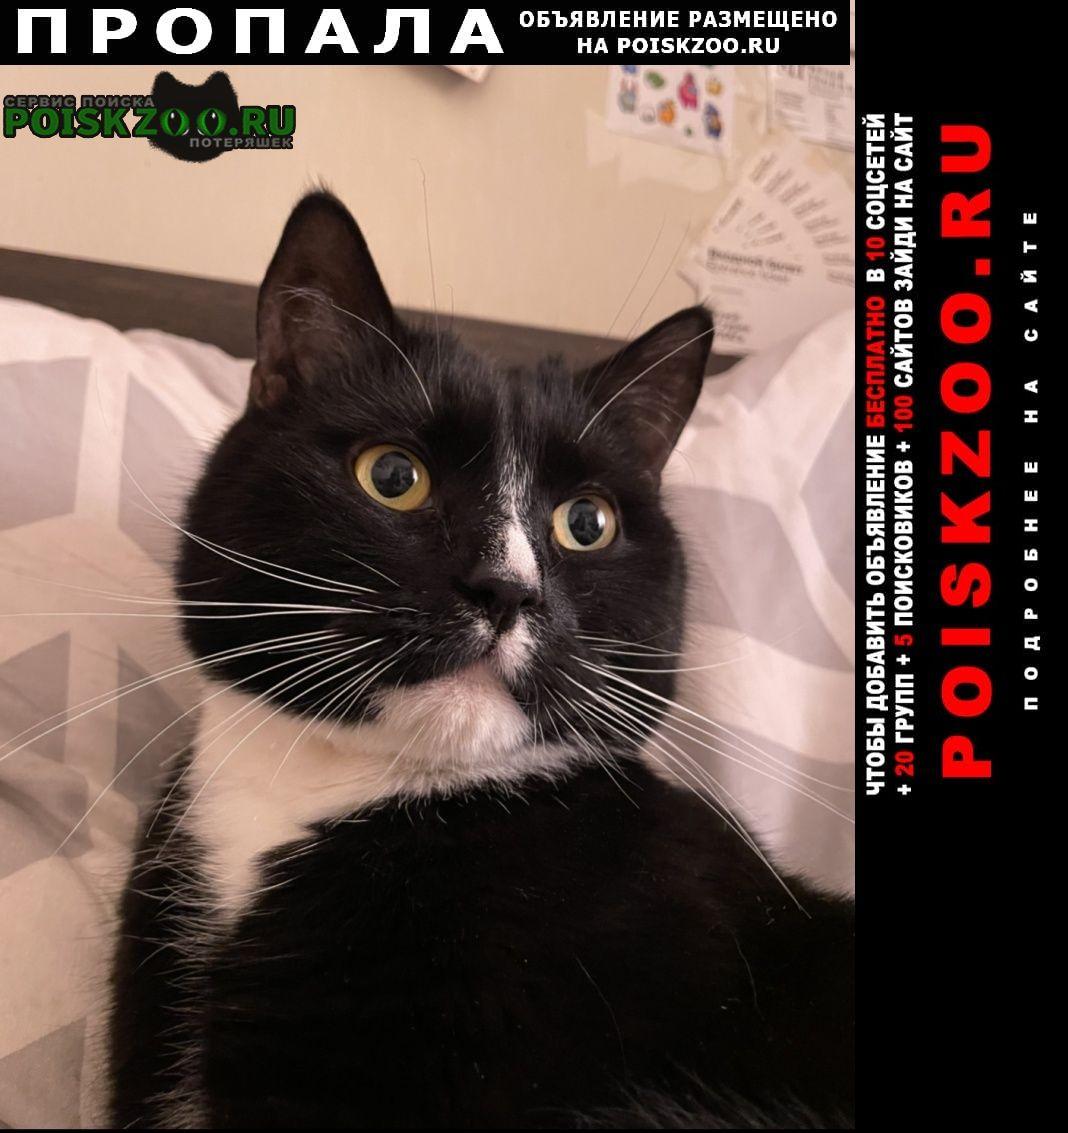 Пропал кот 13 августа Москва